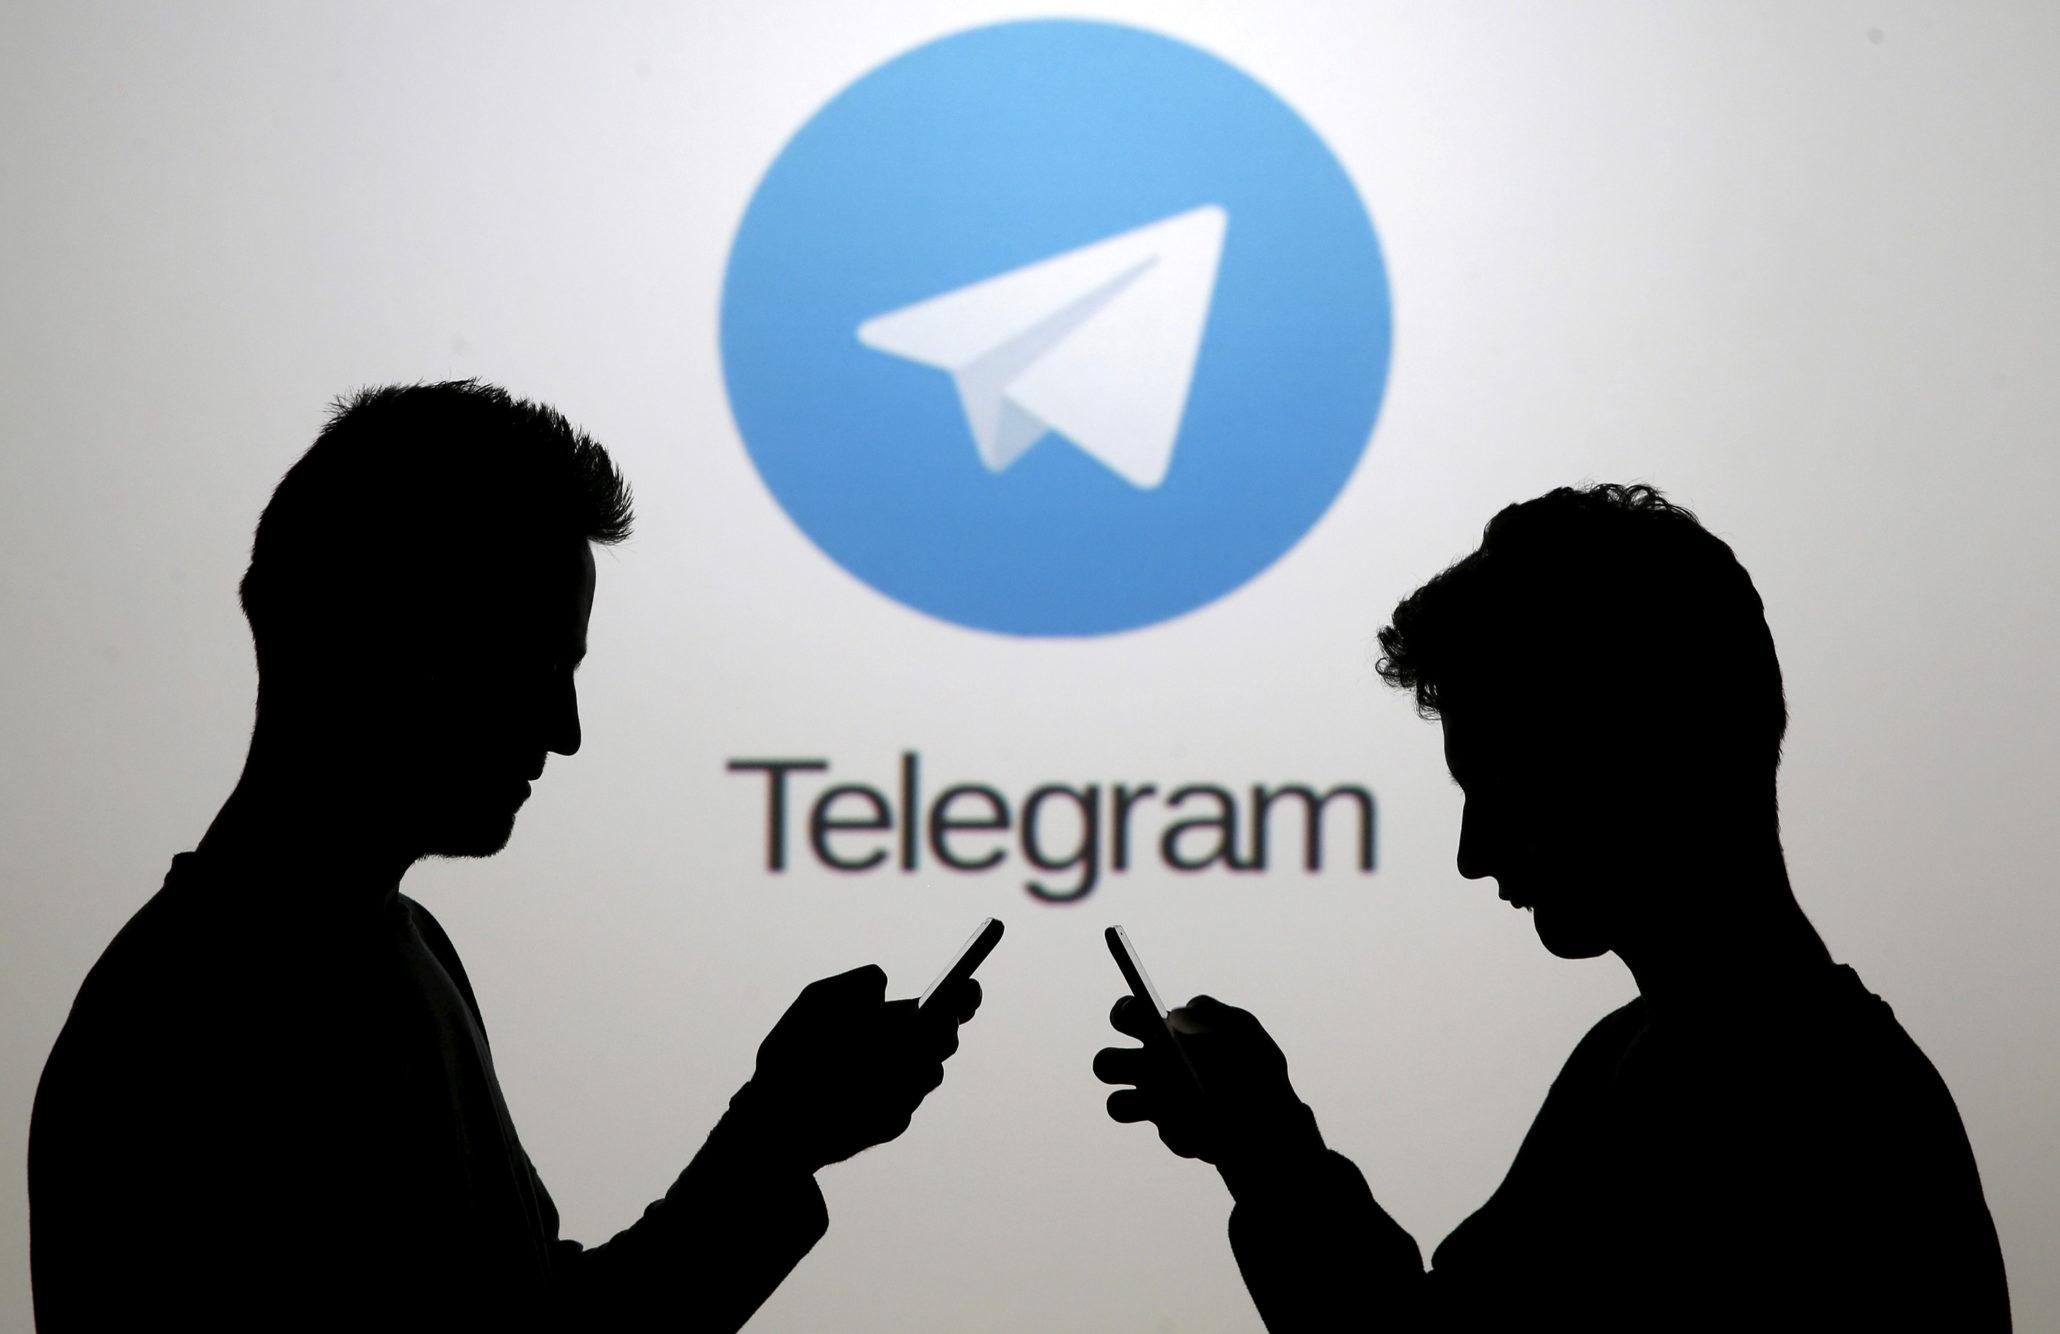 Imagem de Cuidado! Malware minerador de criptomoeda está sendo enviado pelo Telegram no tecmundo